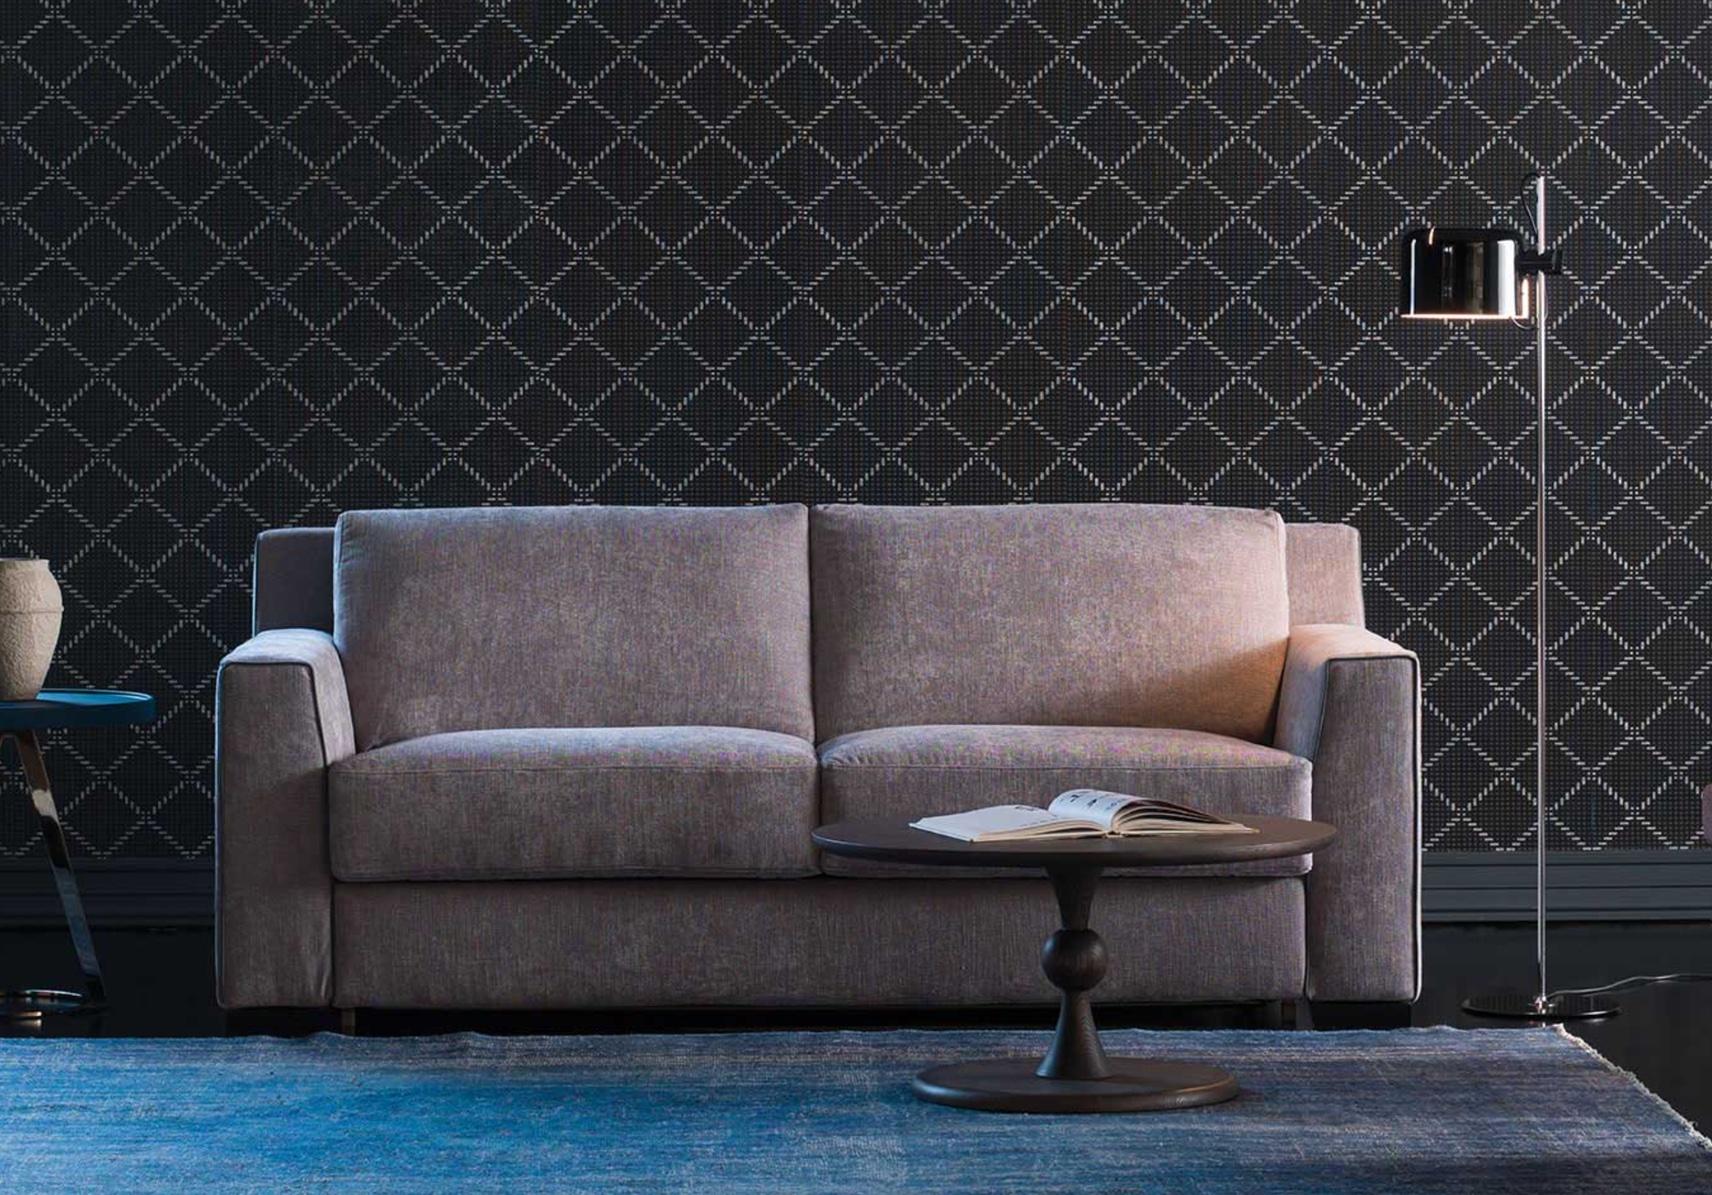 SBD 119 Modern Sofa Beds